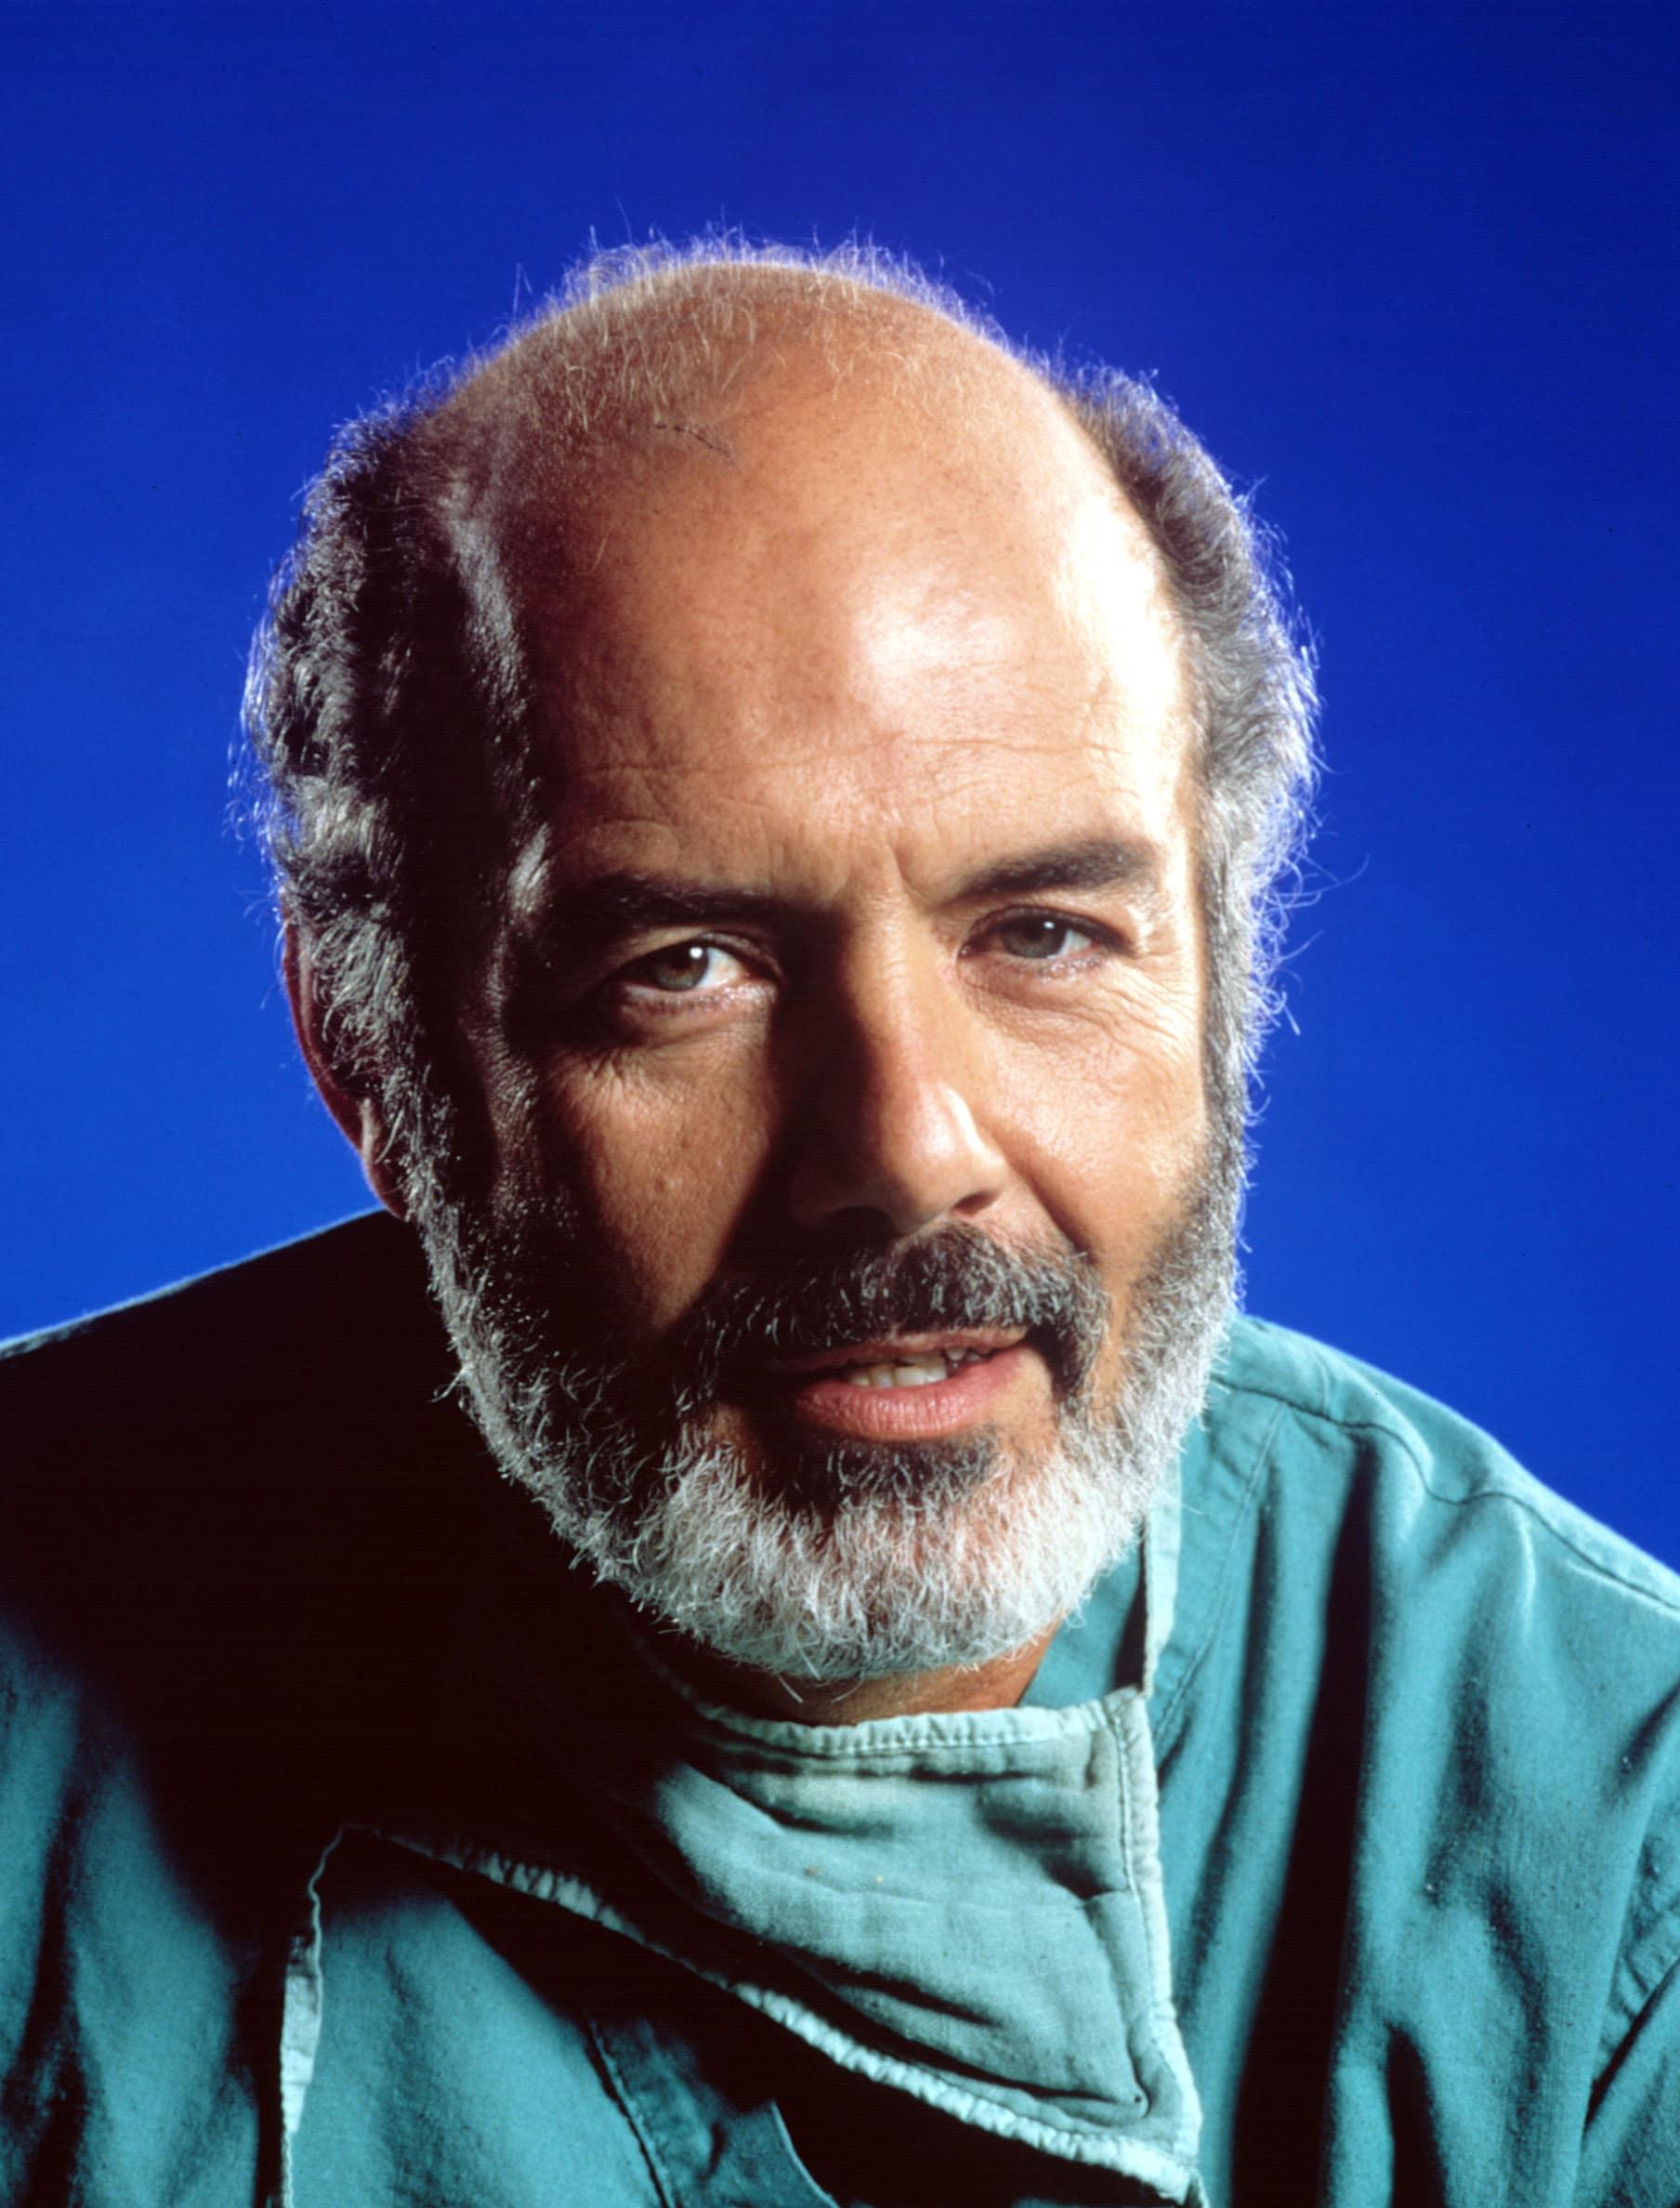 Roberts as Trapper John M.D.